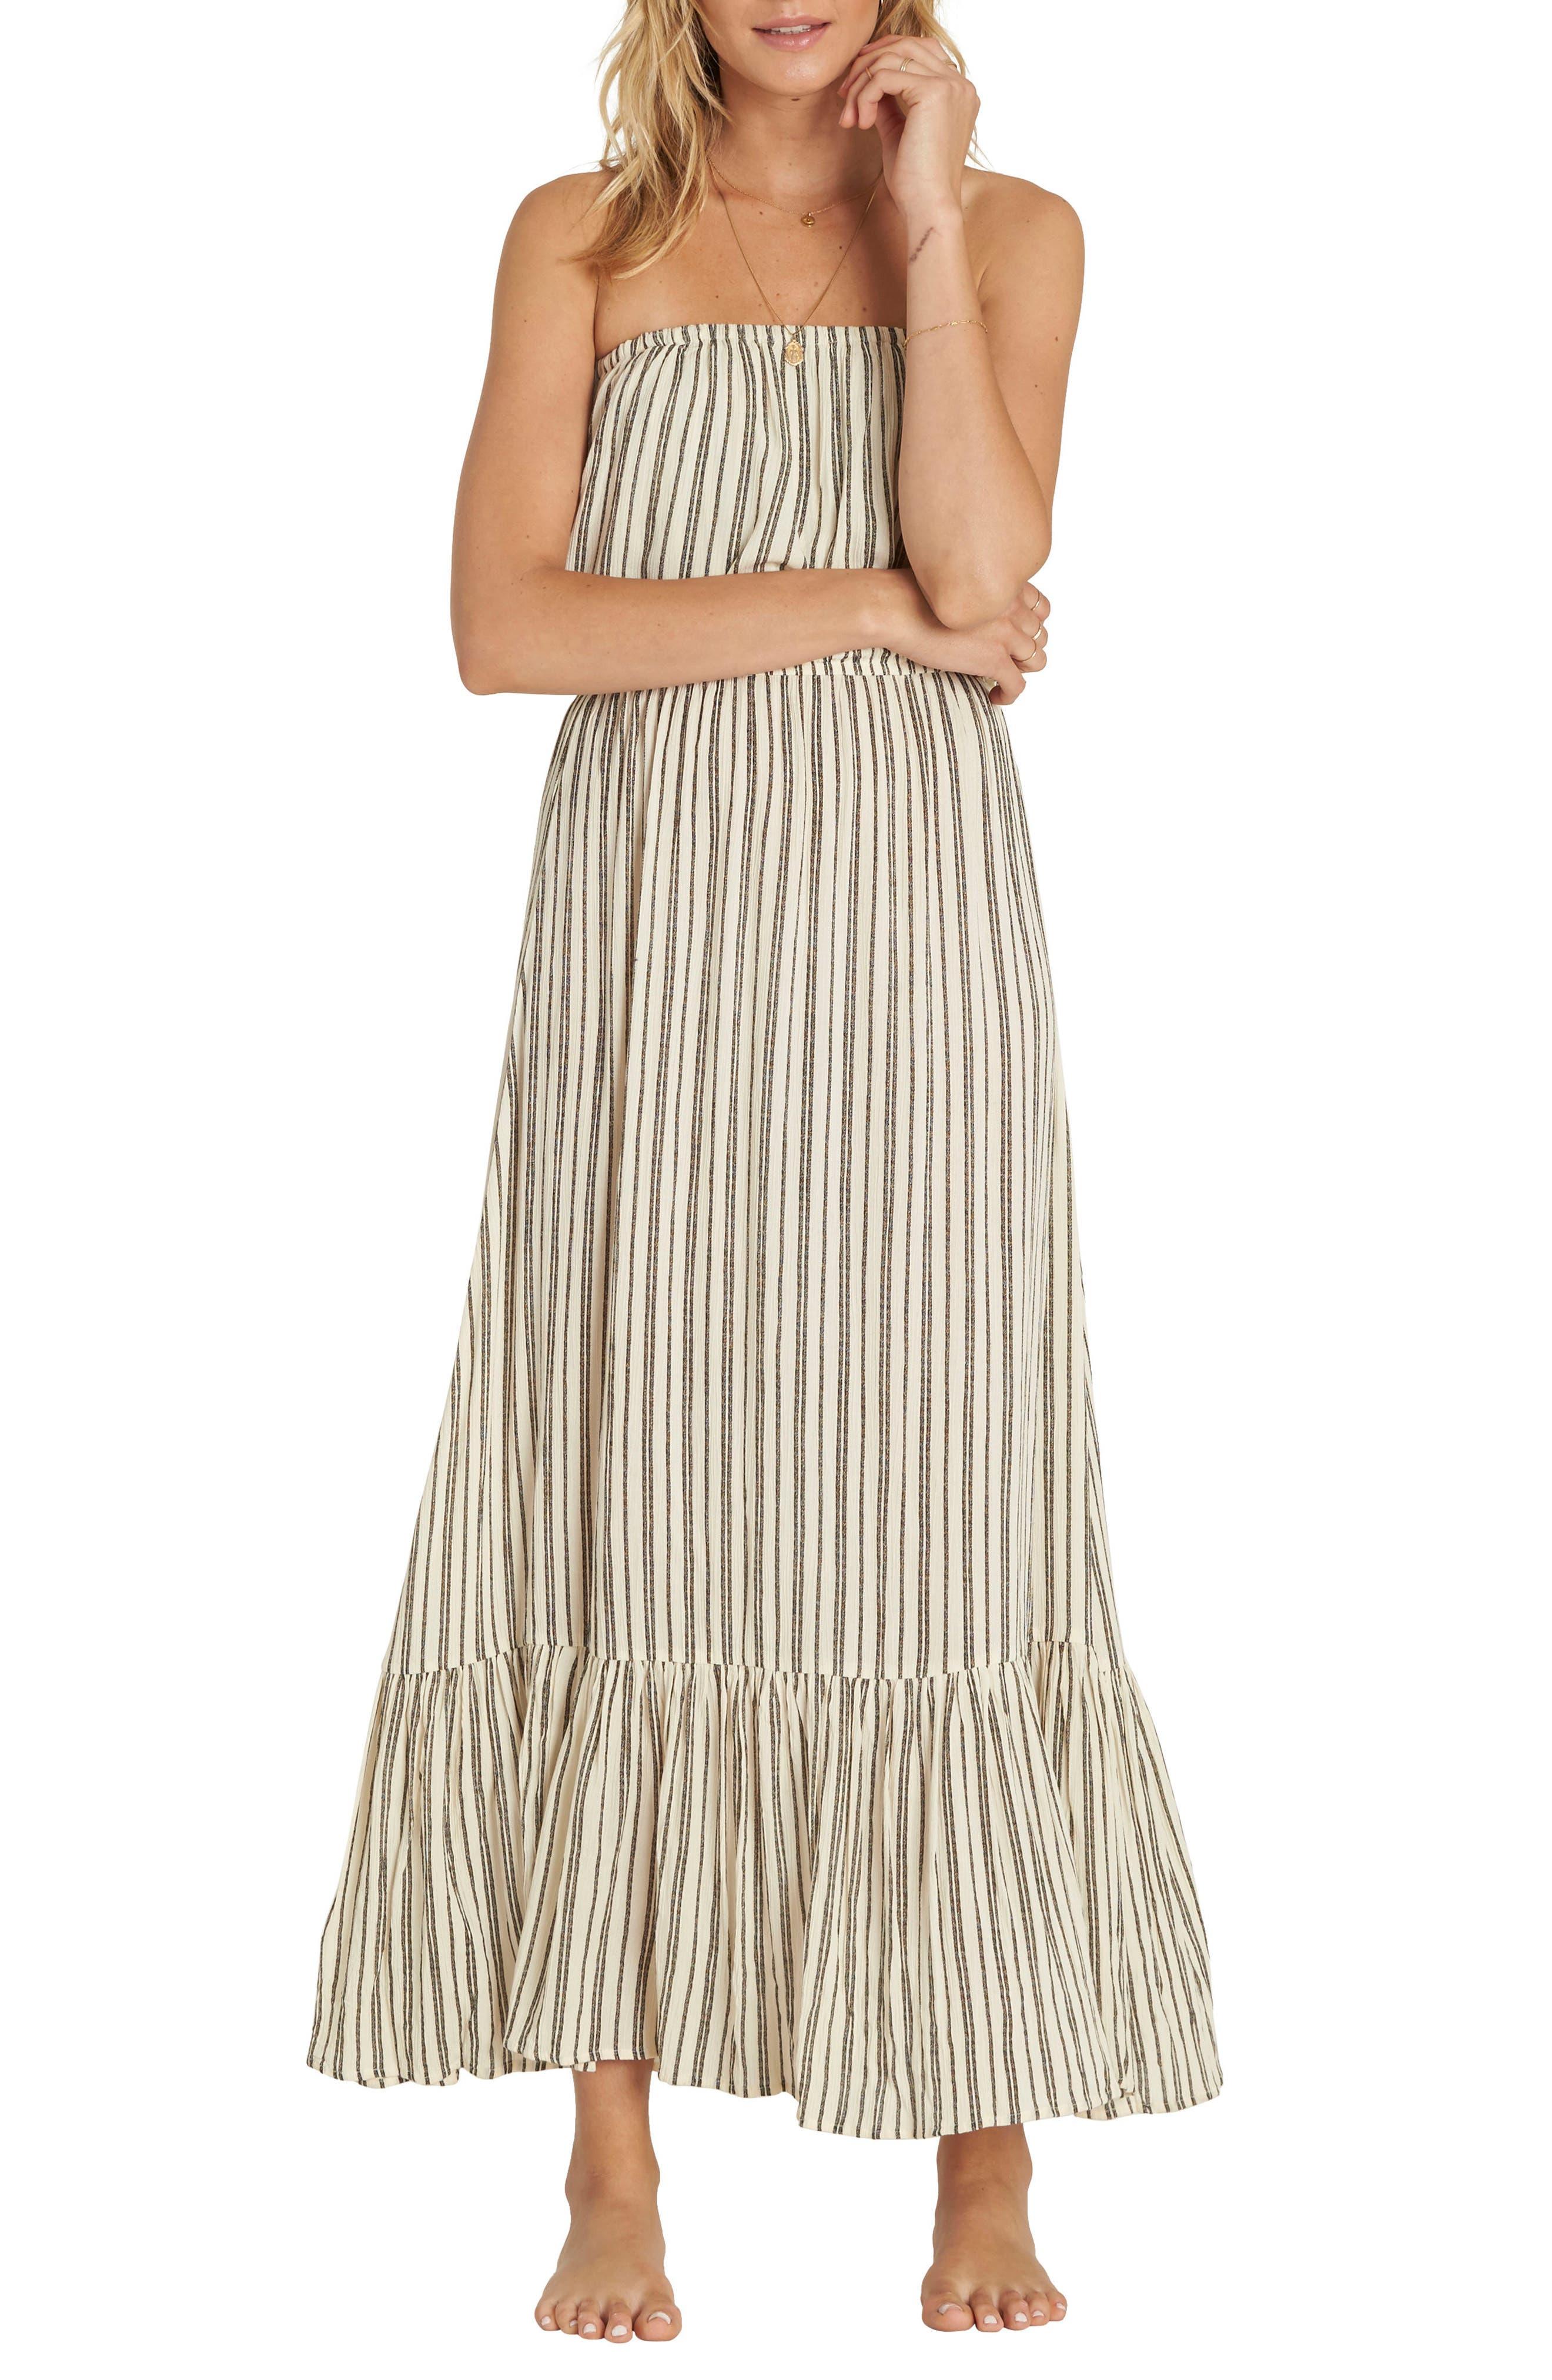 Island Vibes Strapless Maxi Dress,                         Main,                         color, White Cap